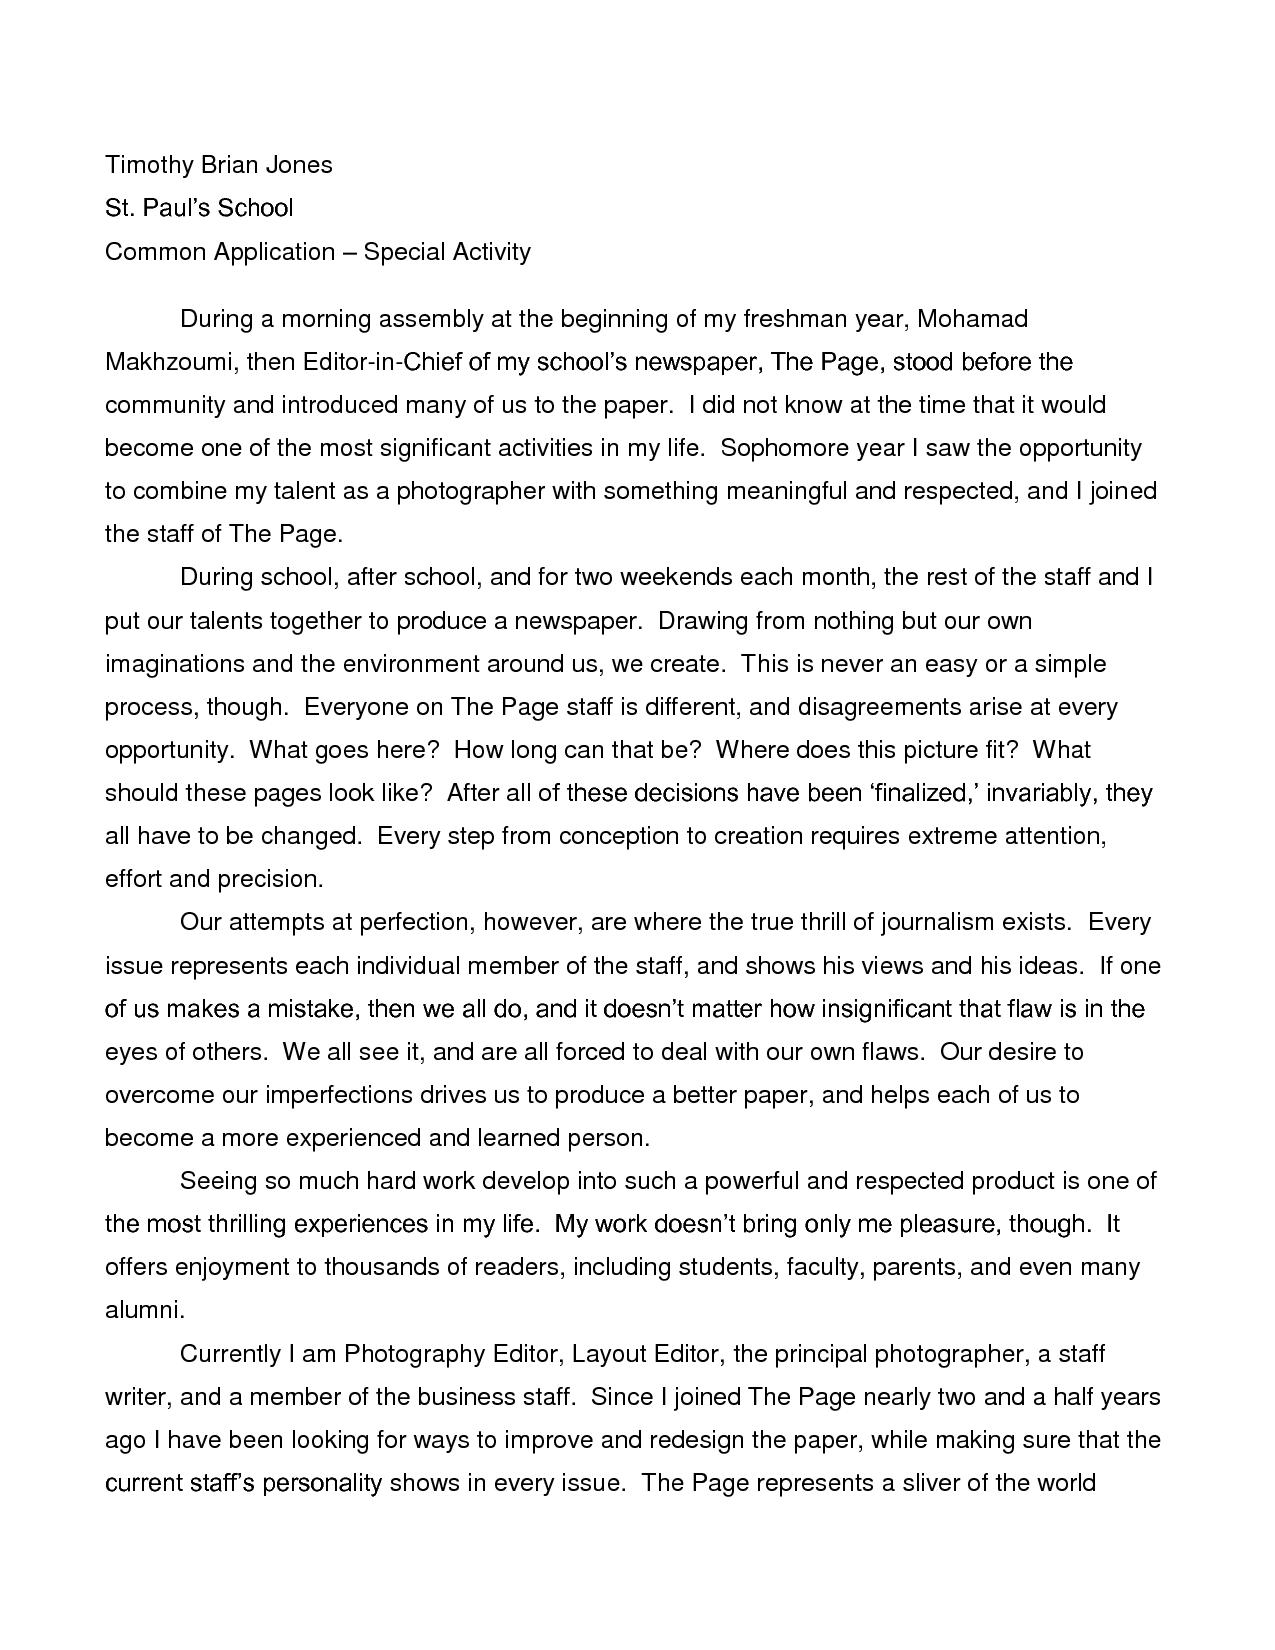 015 Bm4a9xkecf Common App Examples Best Example Essays Application Essay Harvard Prompts 2014-15 Full